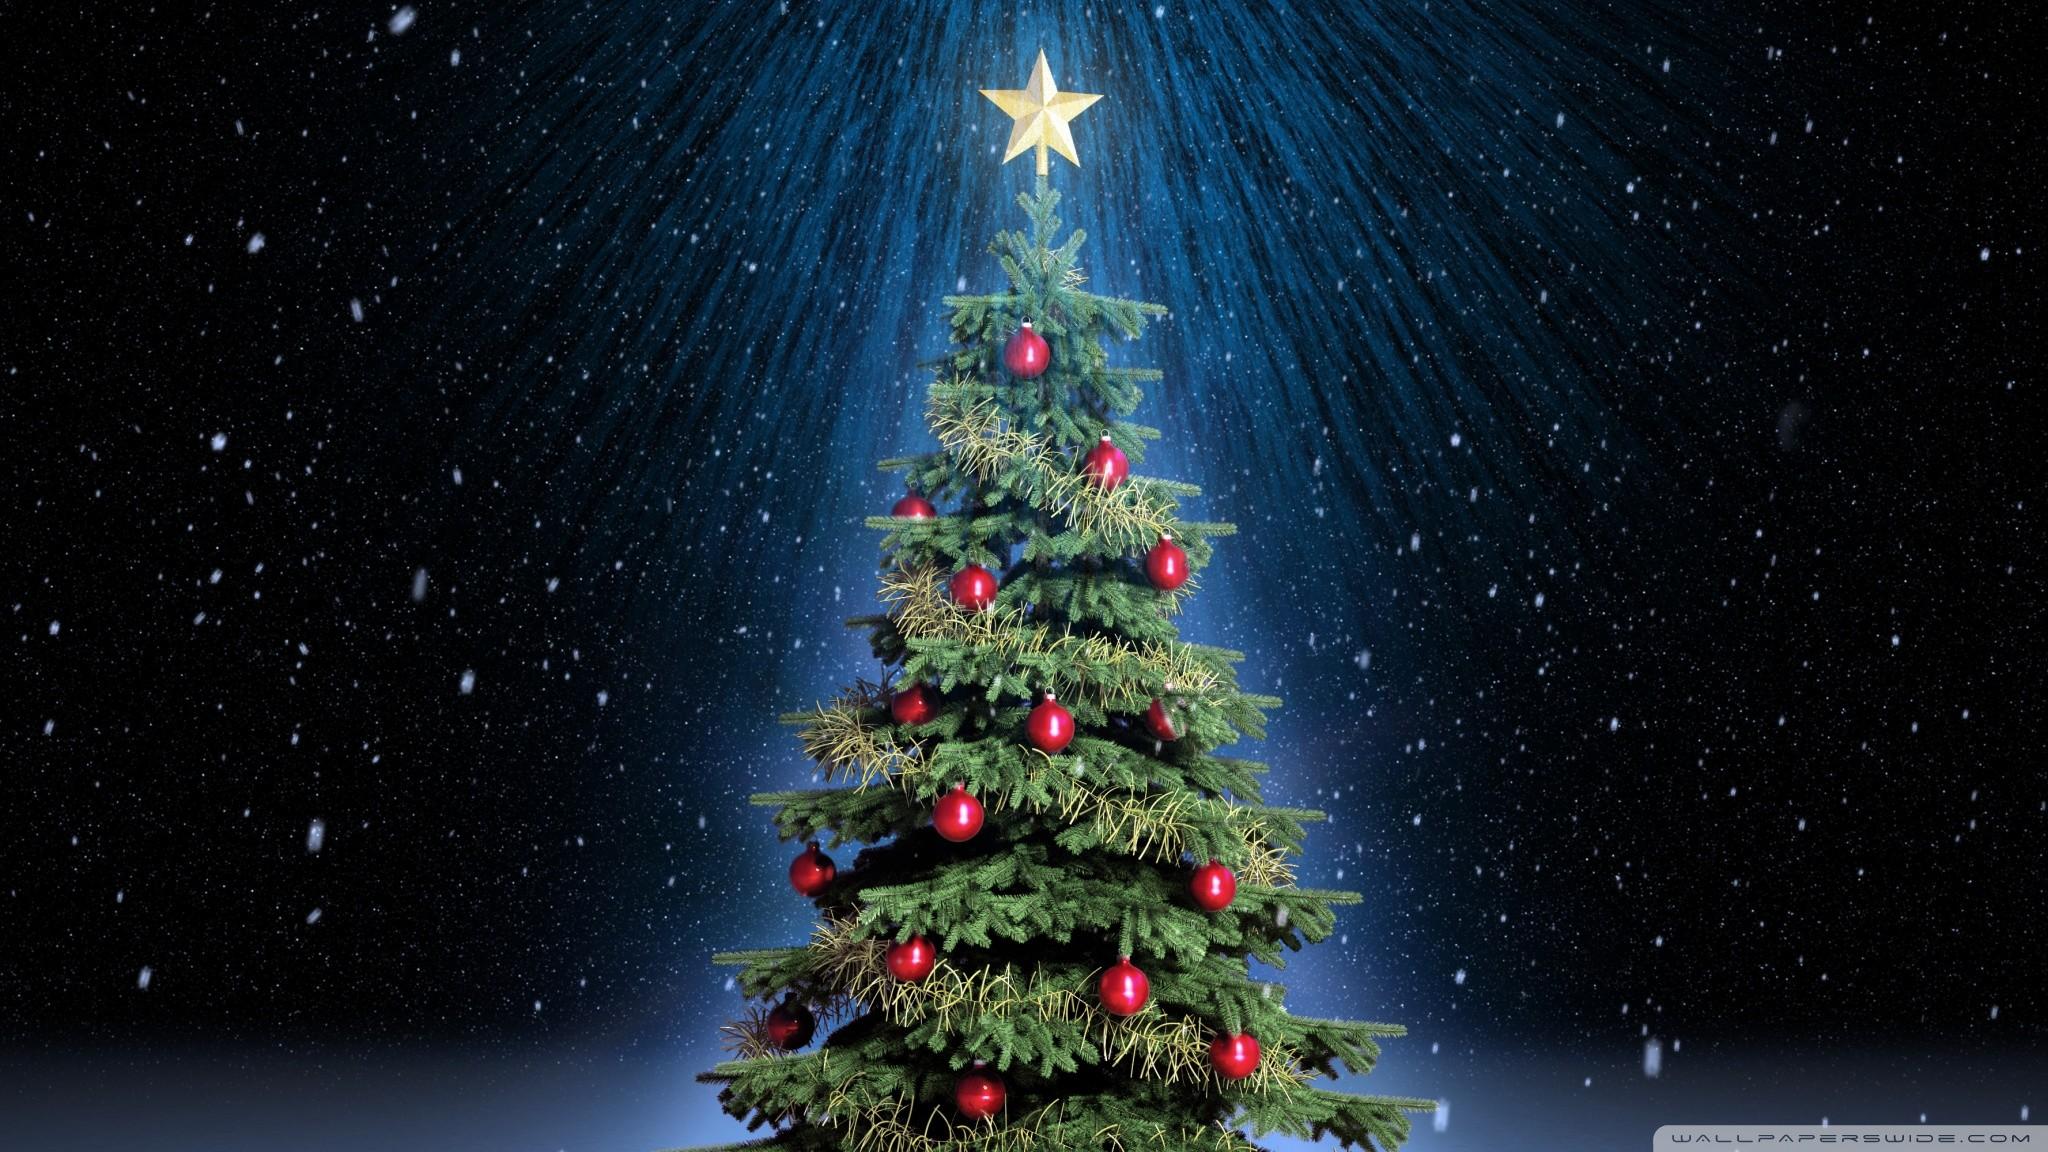 … holidays wallpapers; clic christmas tree hd desktop wallpaper  widescreen high …